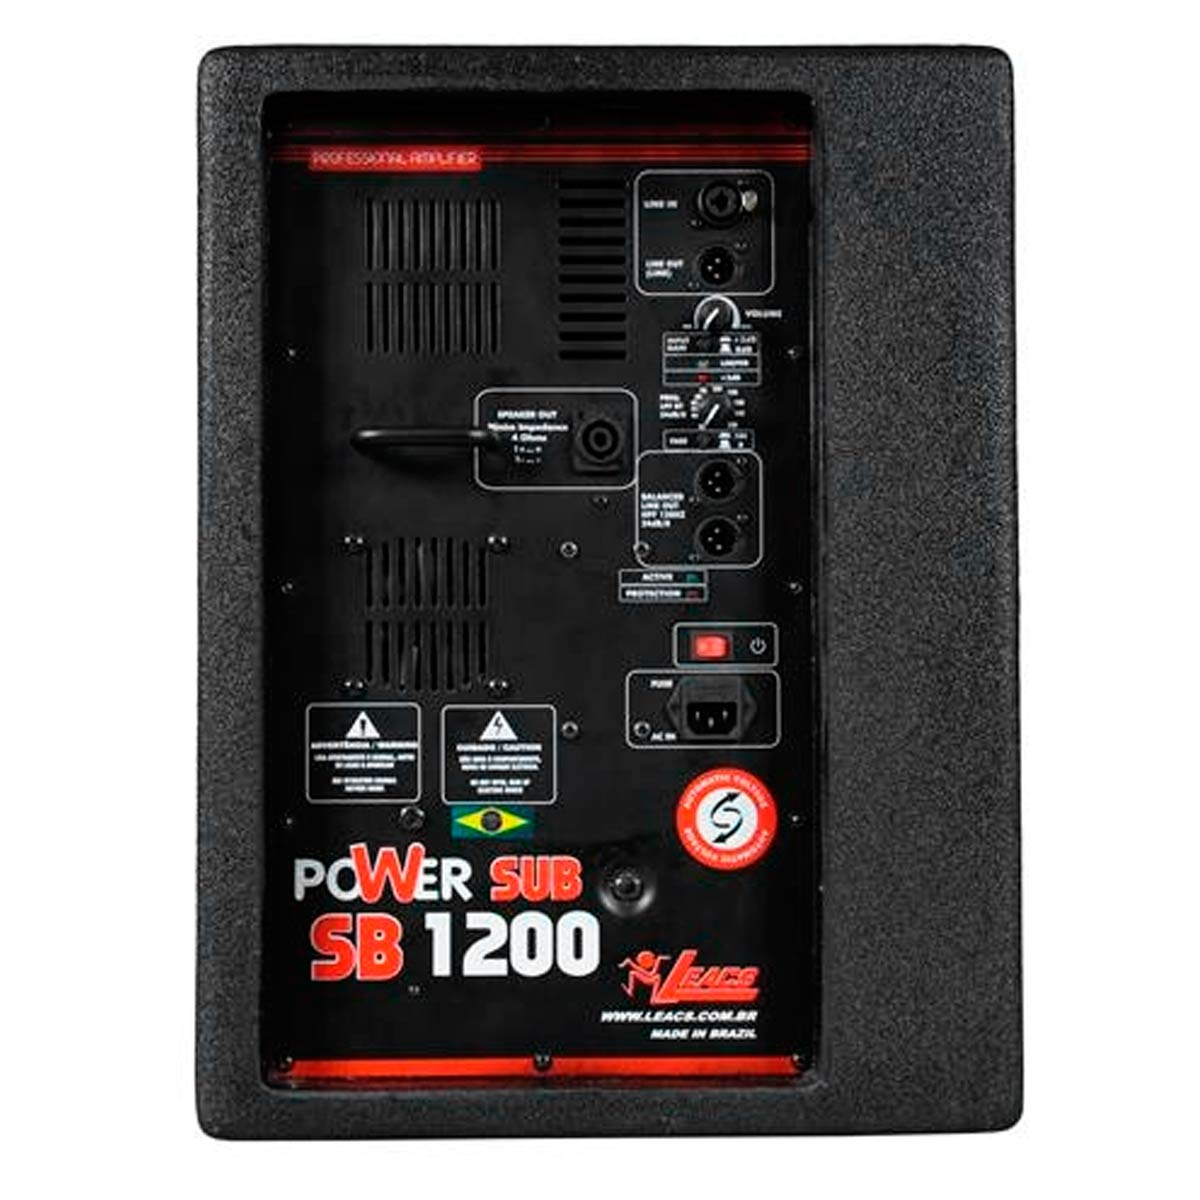 SB1200 - Subwoofer Ativo 600W SB 1200 - Leacs